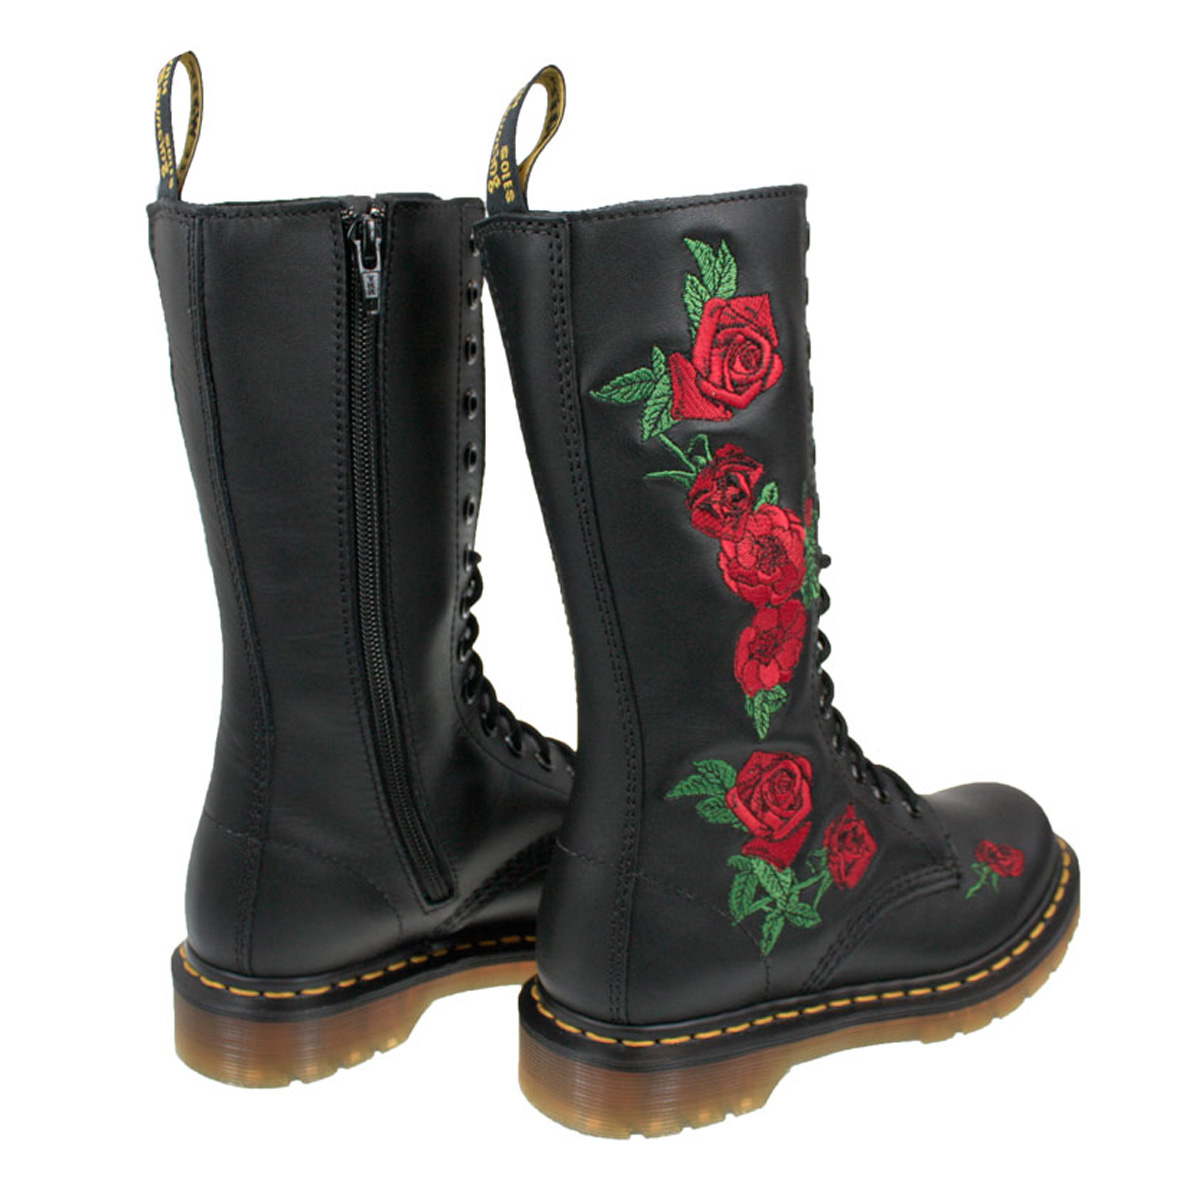 5eb9da8b33e8 Dr. Martens Vonda Womens Docs Black Leather Mid Calf Boots Lace Up ...